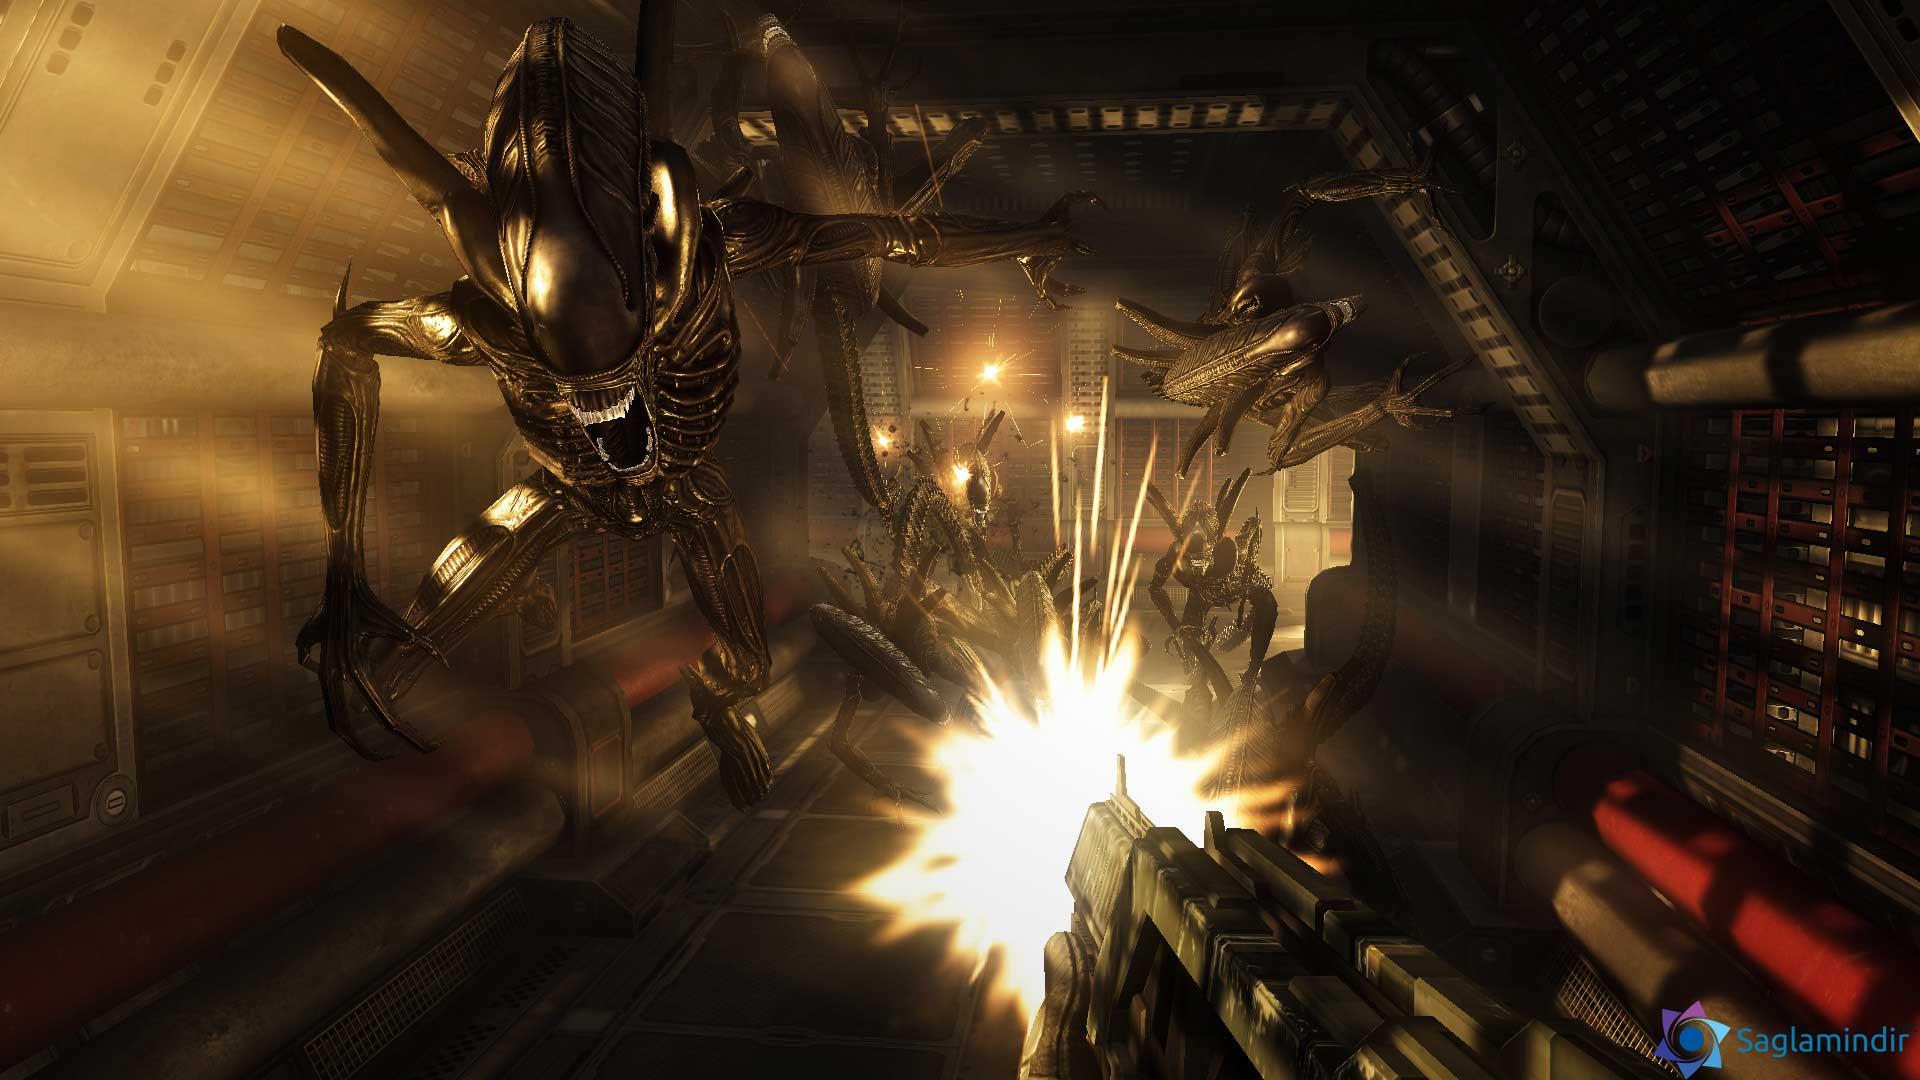 Aliens vs. Predator saglamindir